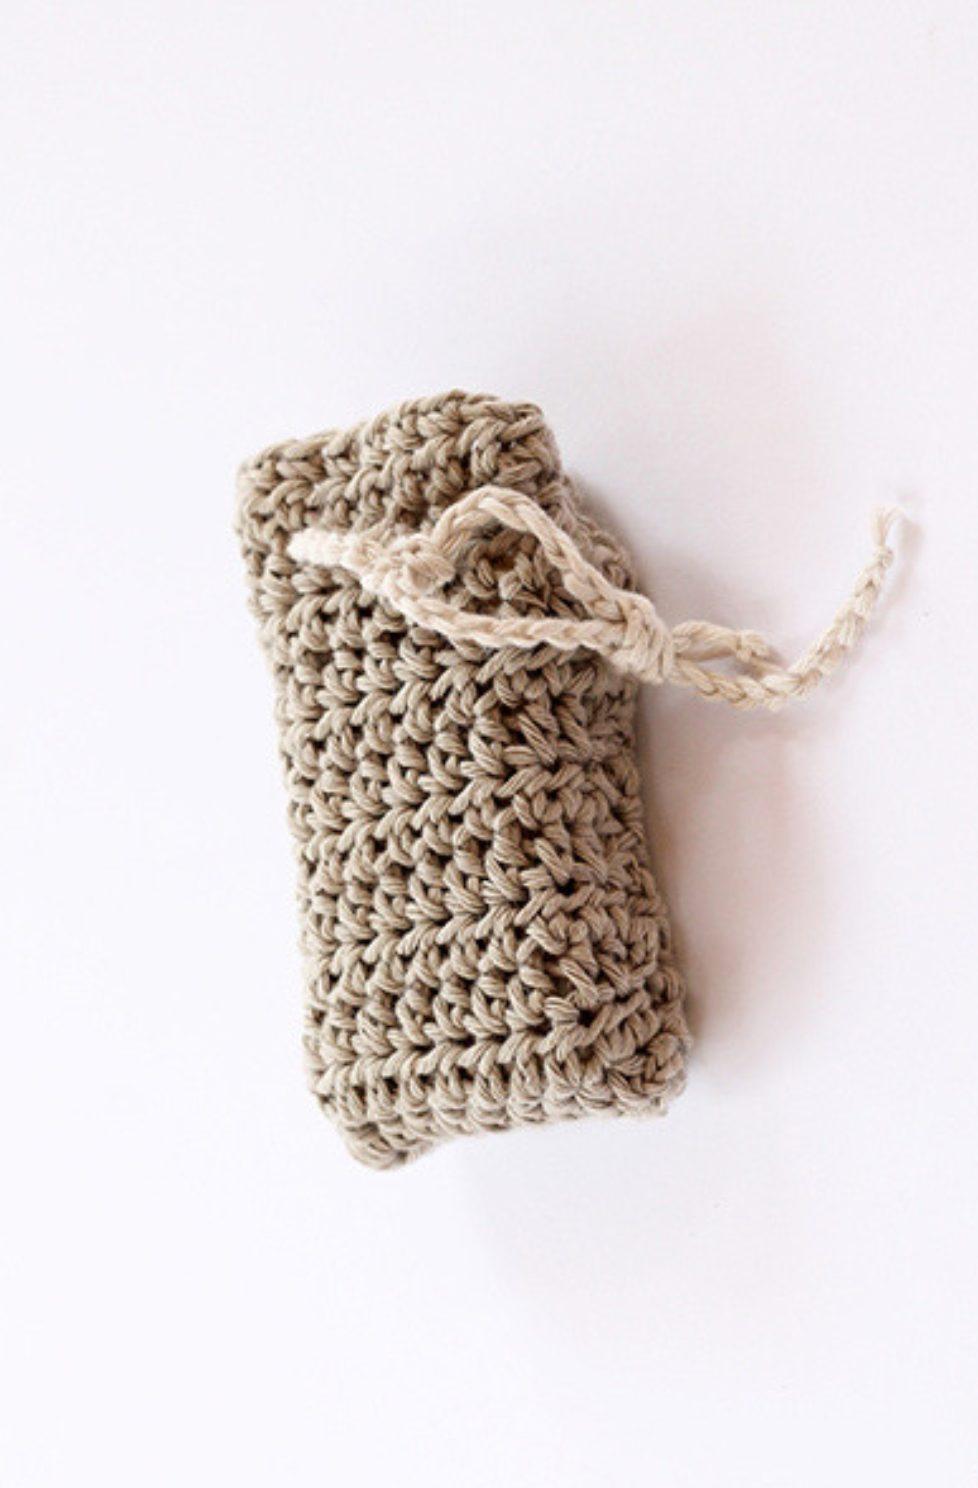 Crochet soap holder pattern